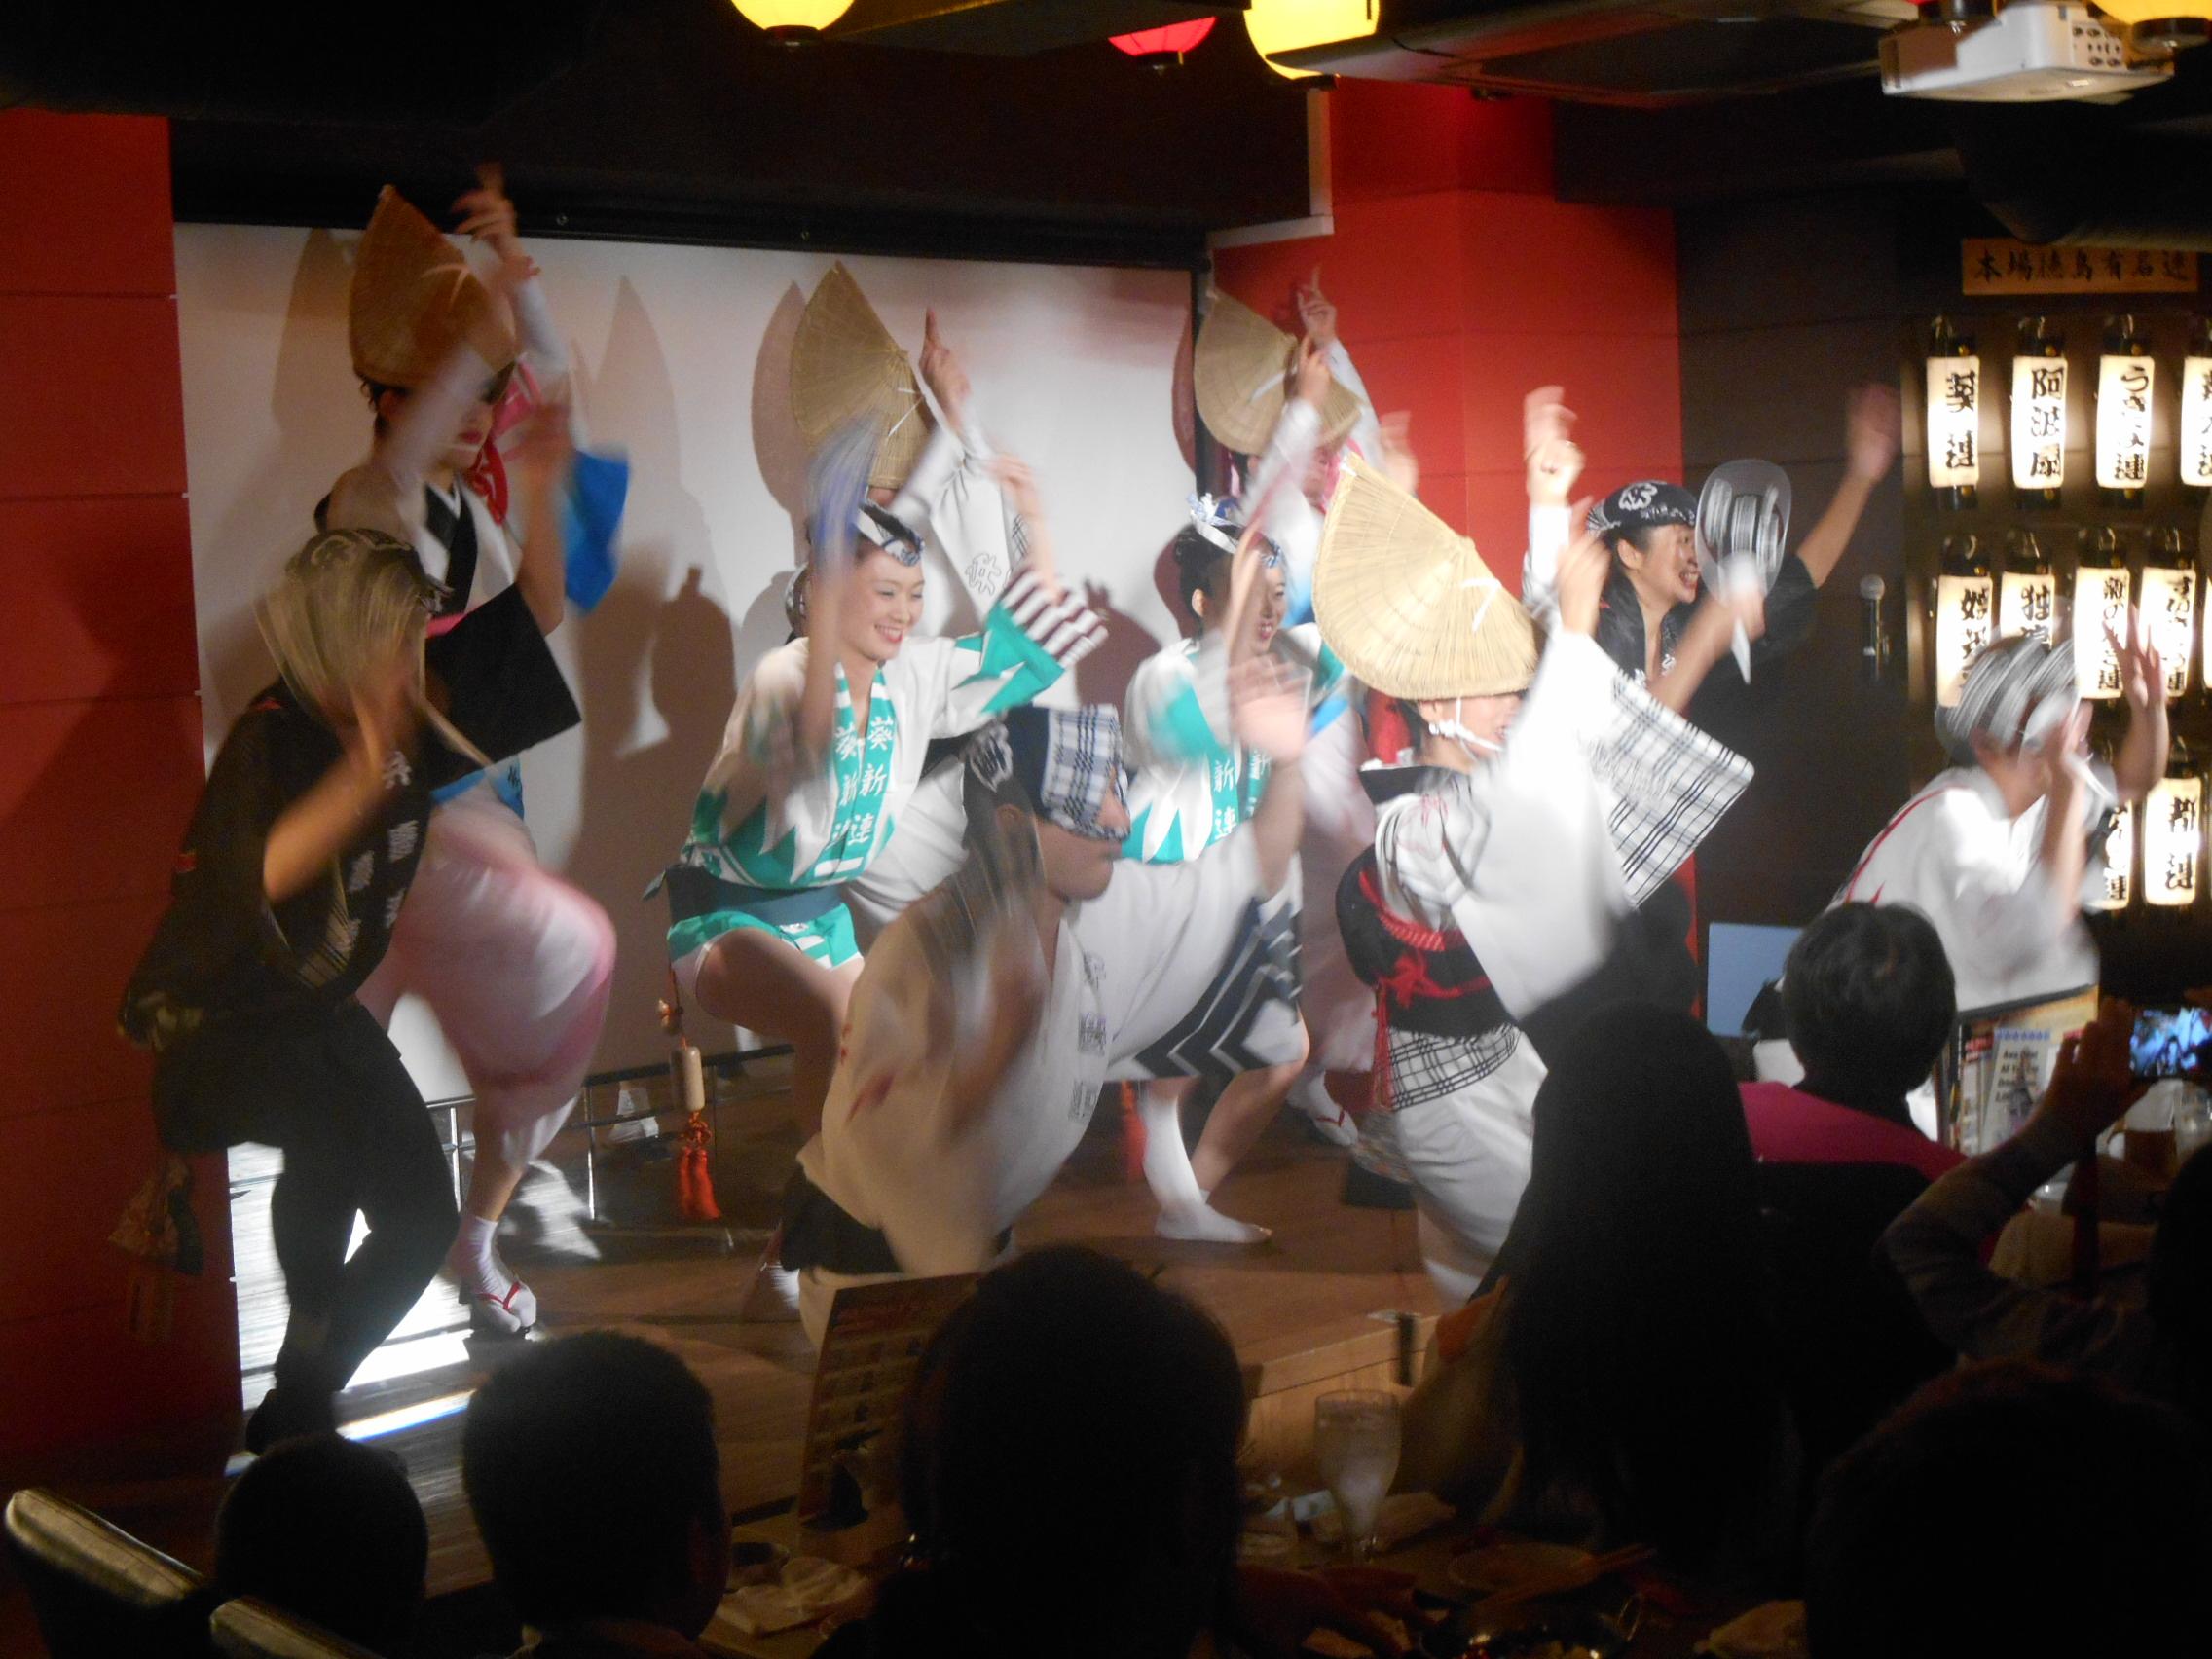 DSCN2120 - 2017年2月4日東京思風塾開催